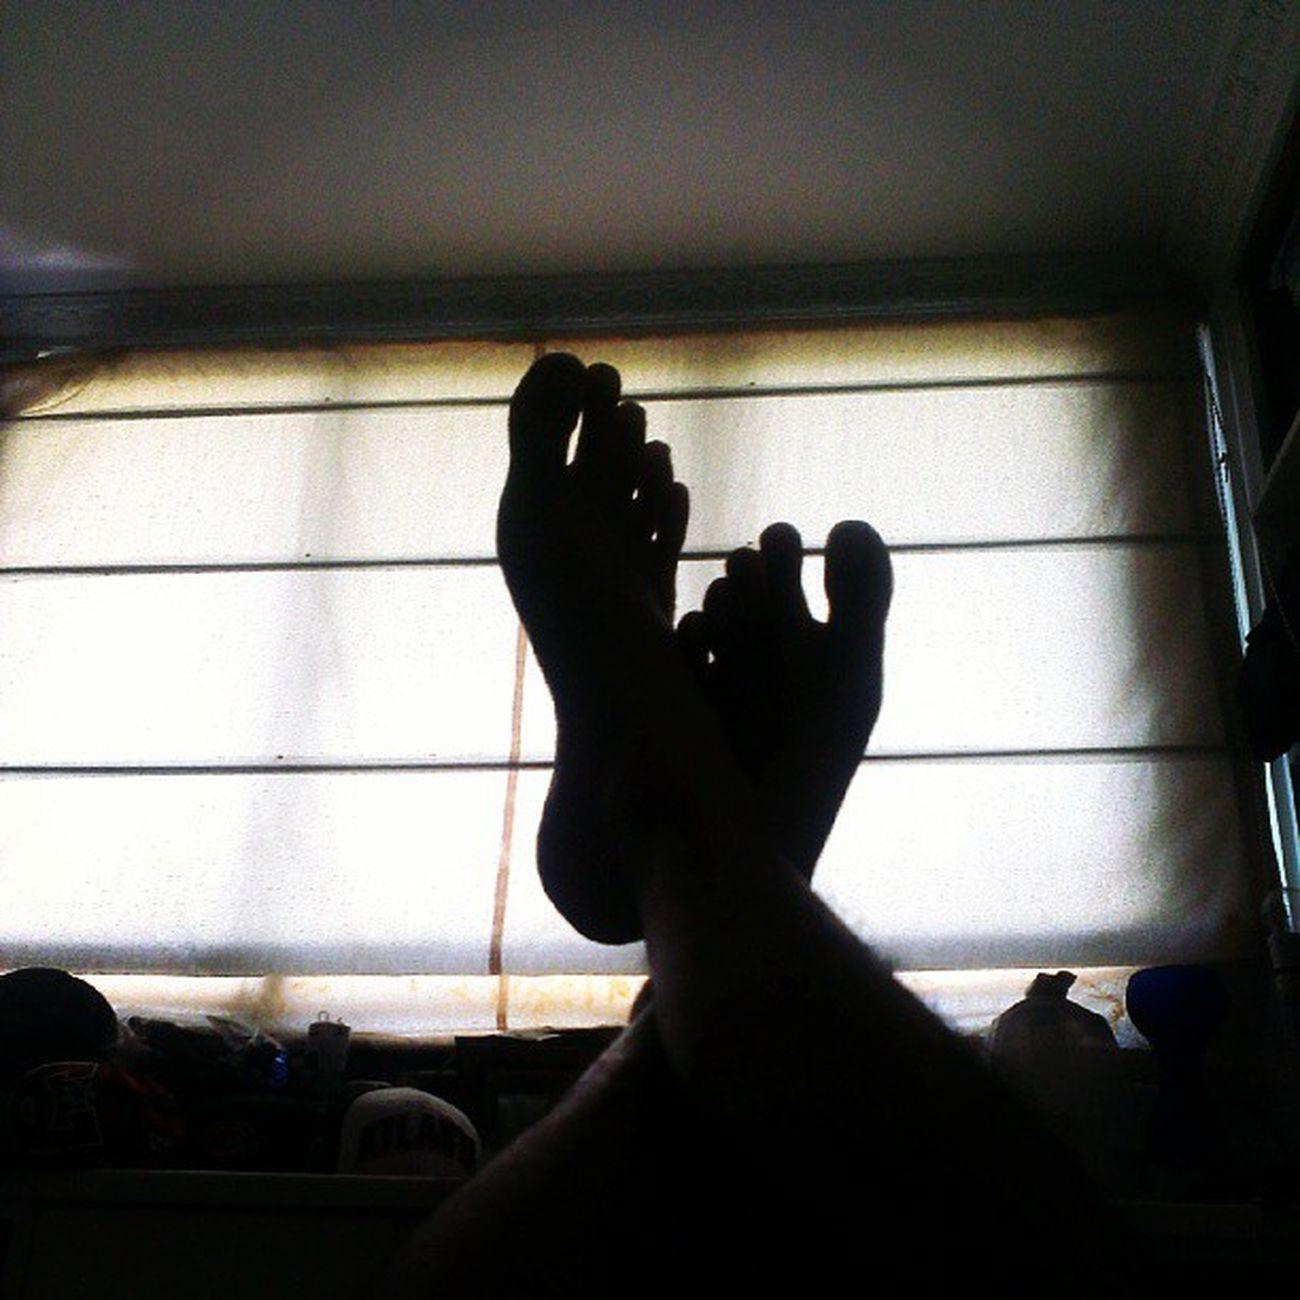 Love waking up to a flat stomach! Legraises AsweatAday Mypantsareliterallyfallingoff !! Abs Fitness Wellness